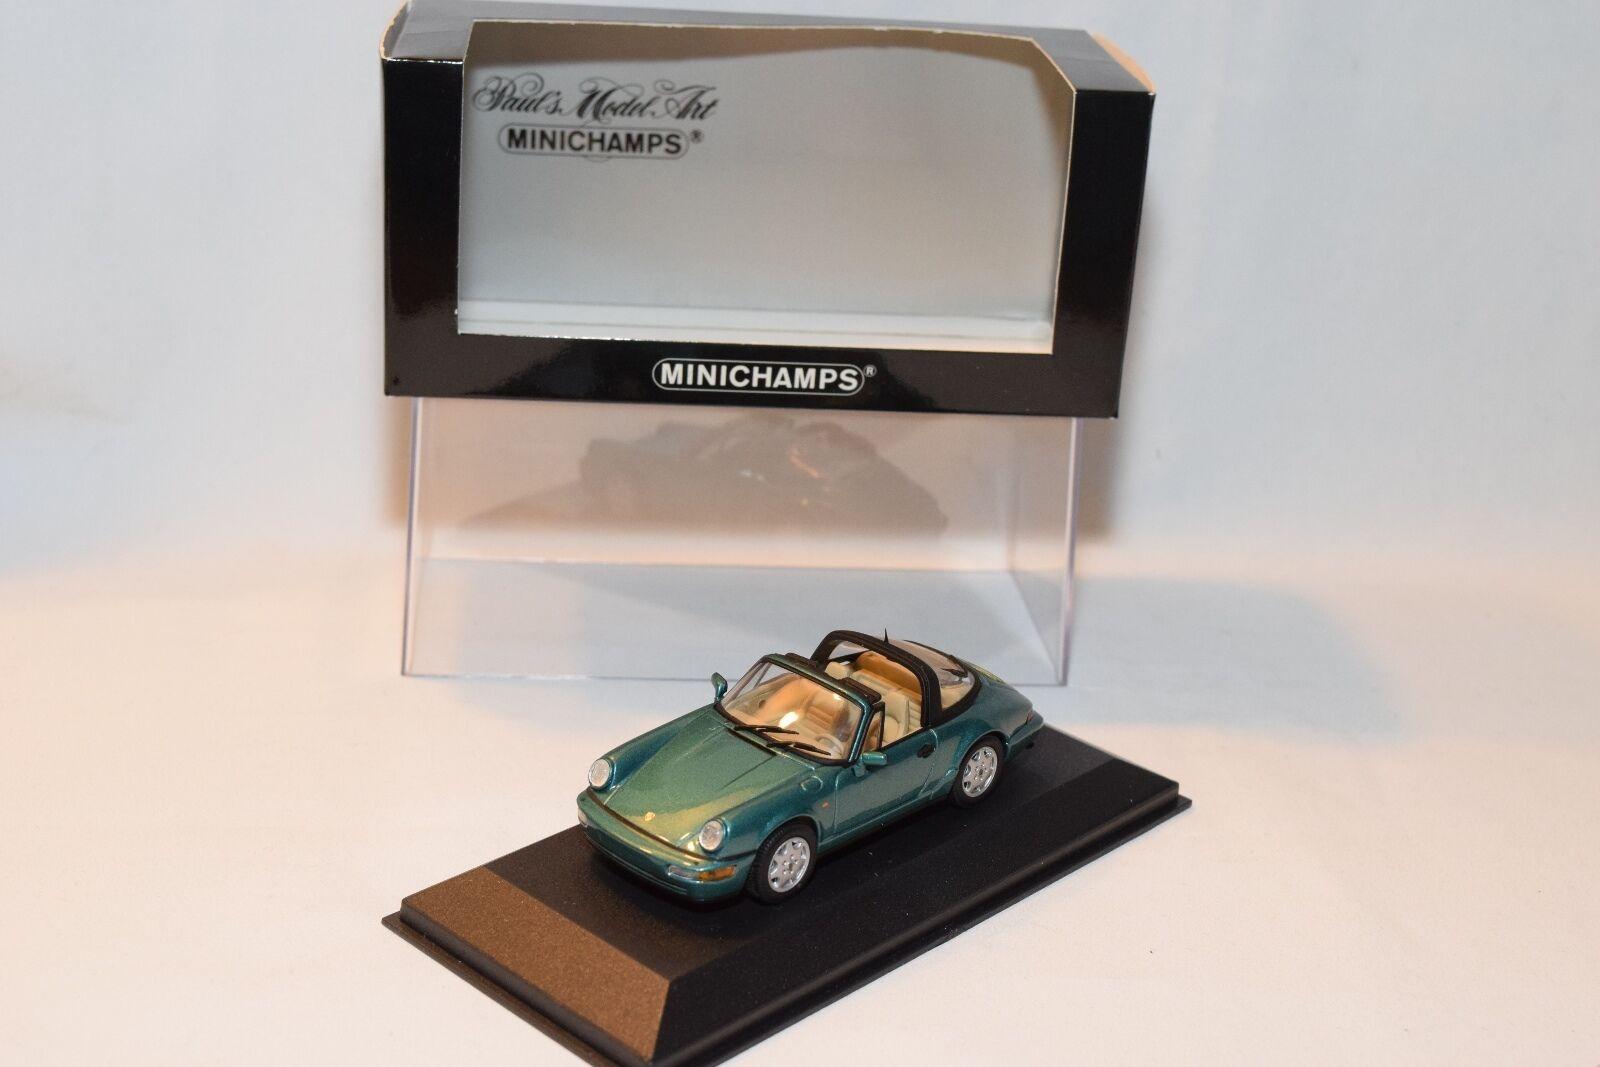 para barato . MINICHAMPS PORSCHE 911 911 911 TARGA 1990 TURQUOISE MINT BOXED  el mas reciente